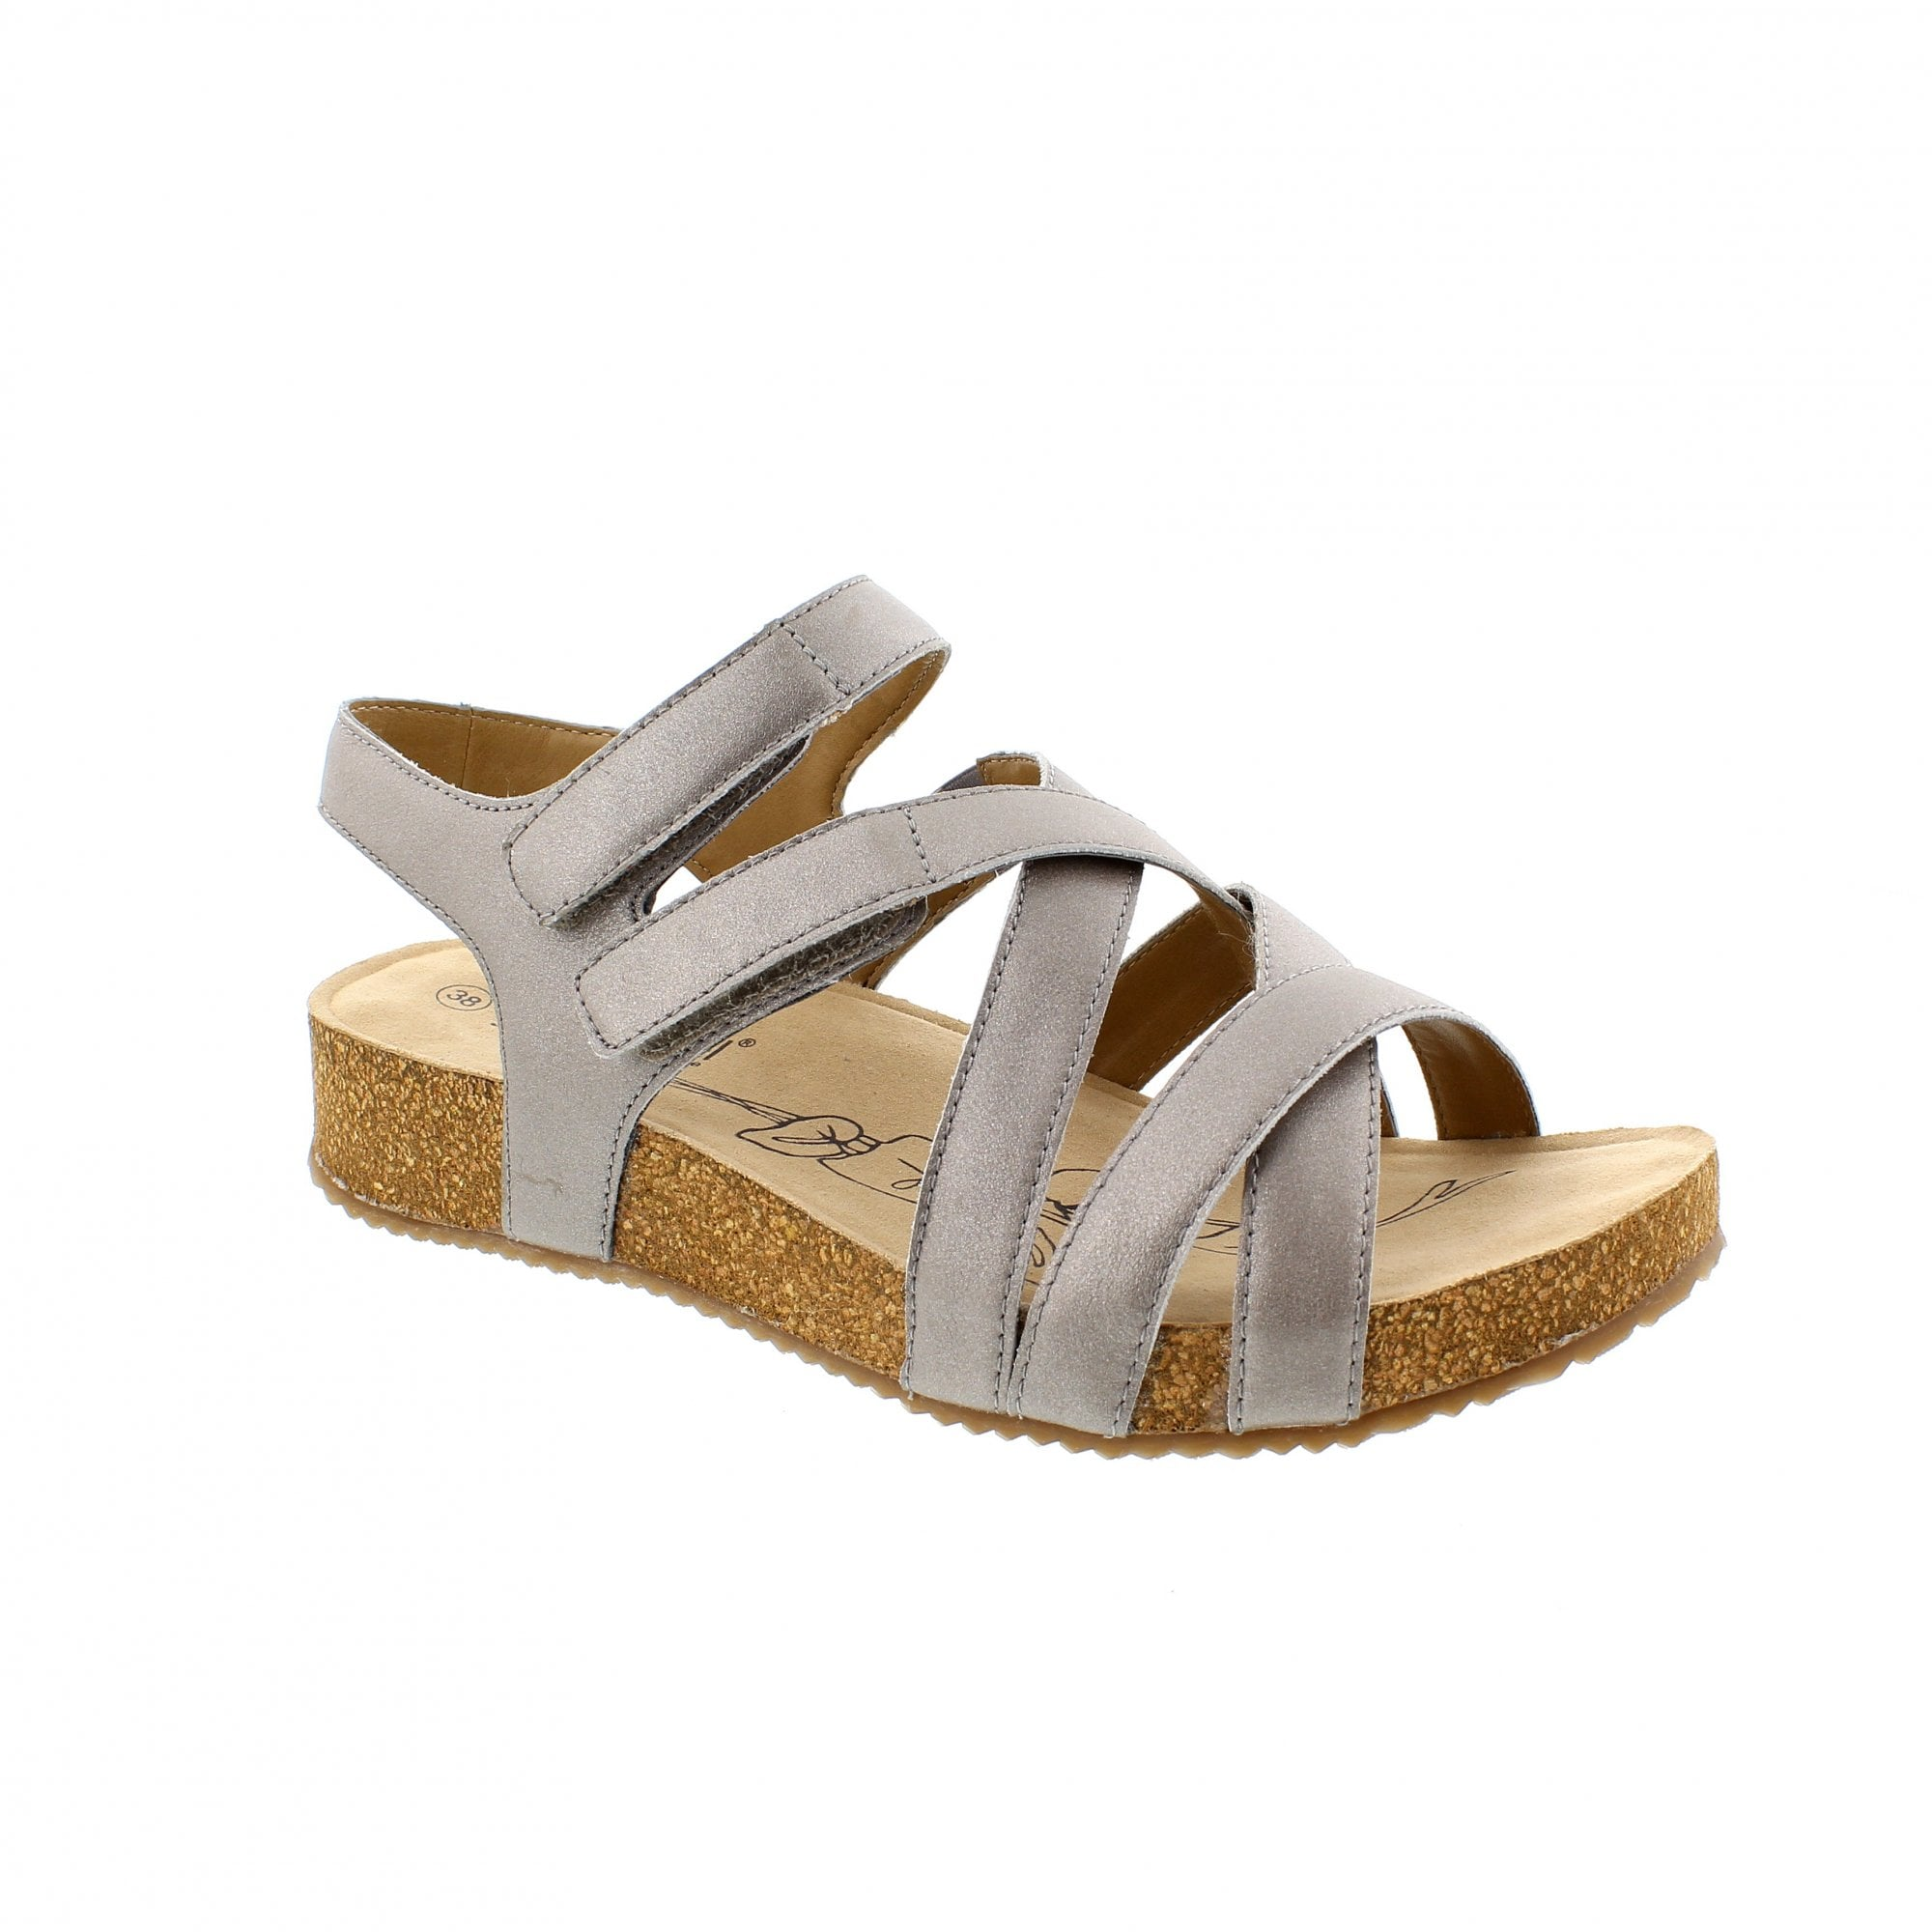 2e2416e57b76 Josef Seibel Tonga 37 78537-38730 Womens Sandals